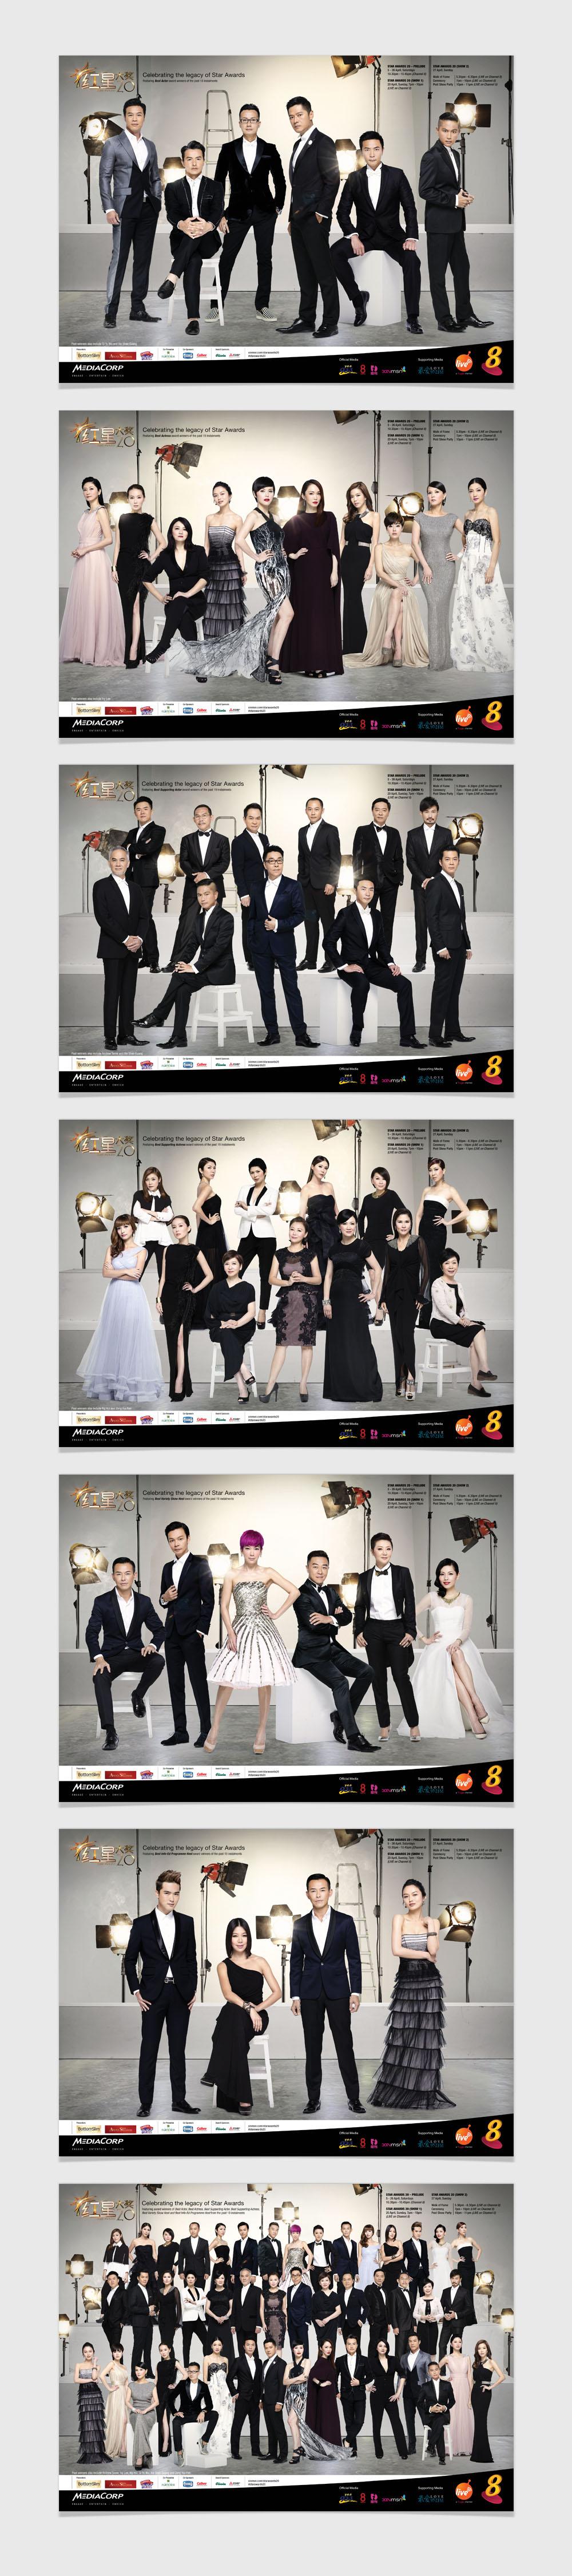 Mediacorp Star Awards 20th Anniversary